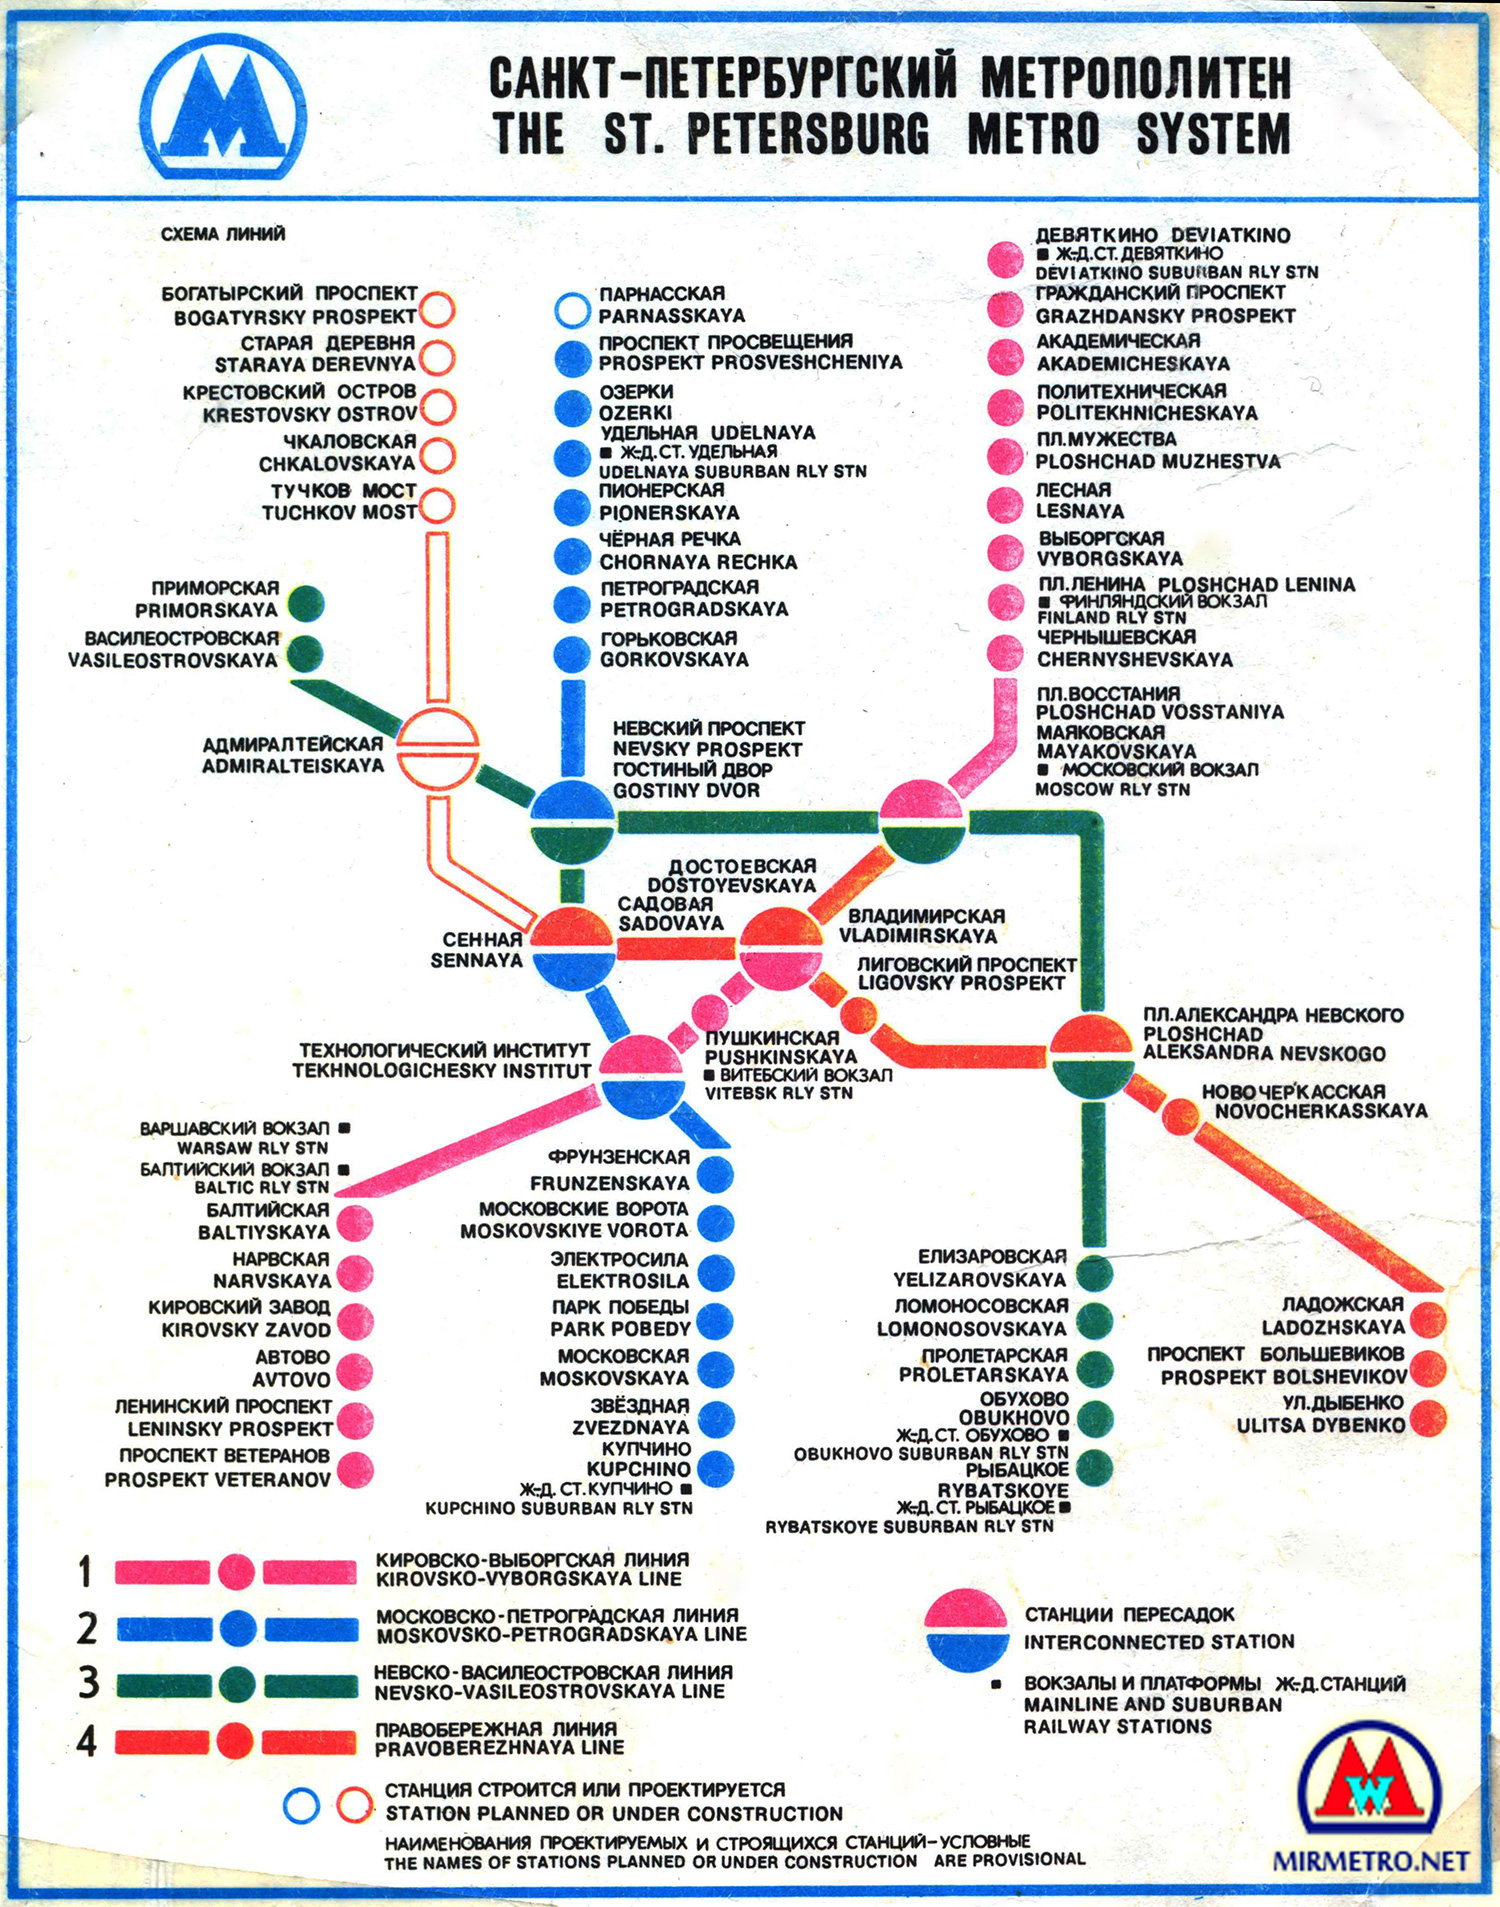 схема петербуржского метрополитена